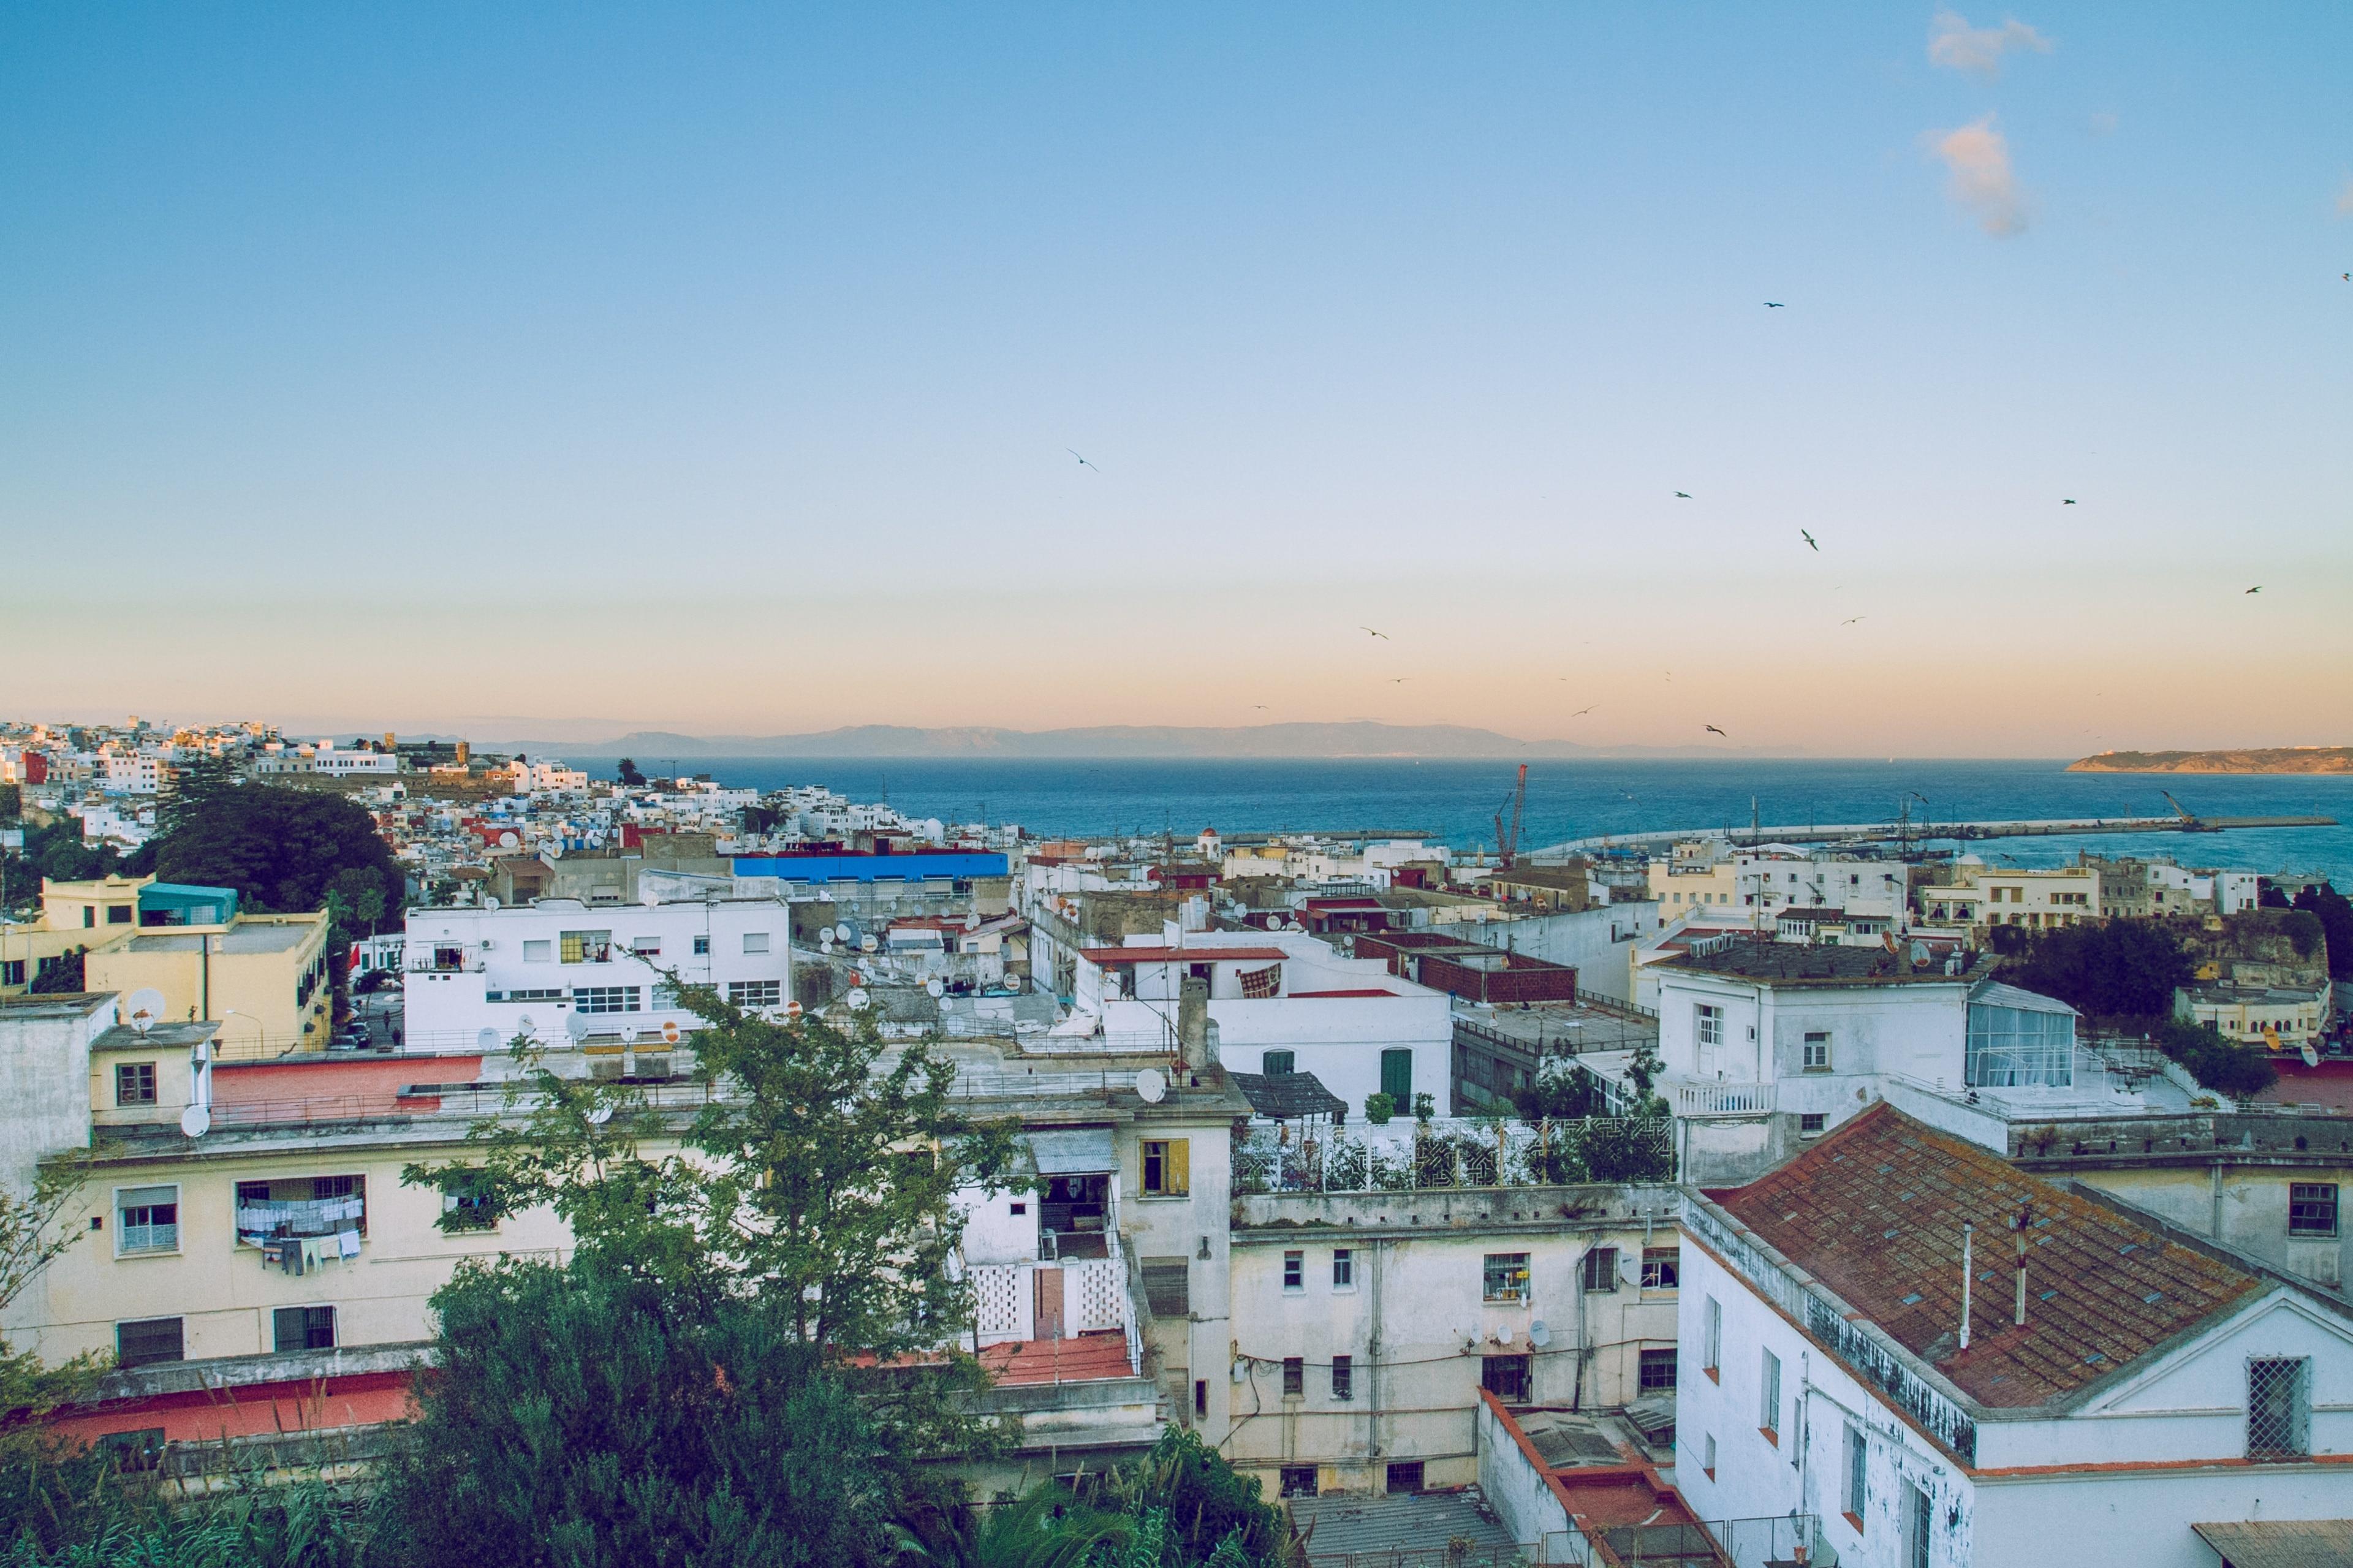 Tangier, Tanger-Tetouan-Al Hoceima, Morocco